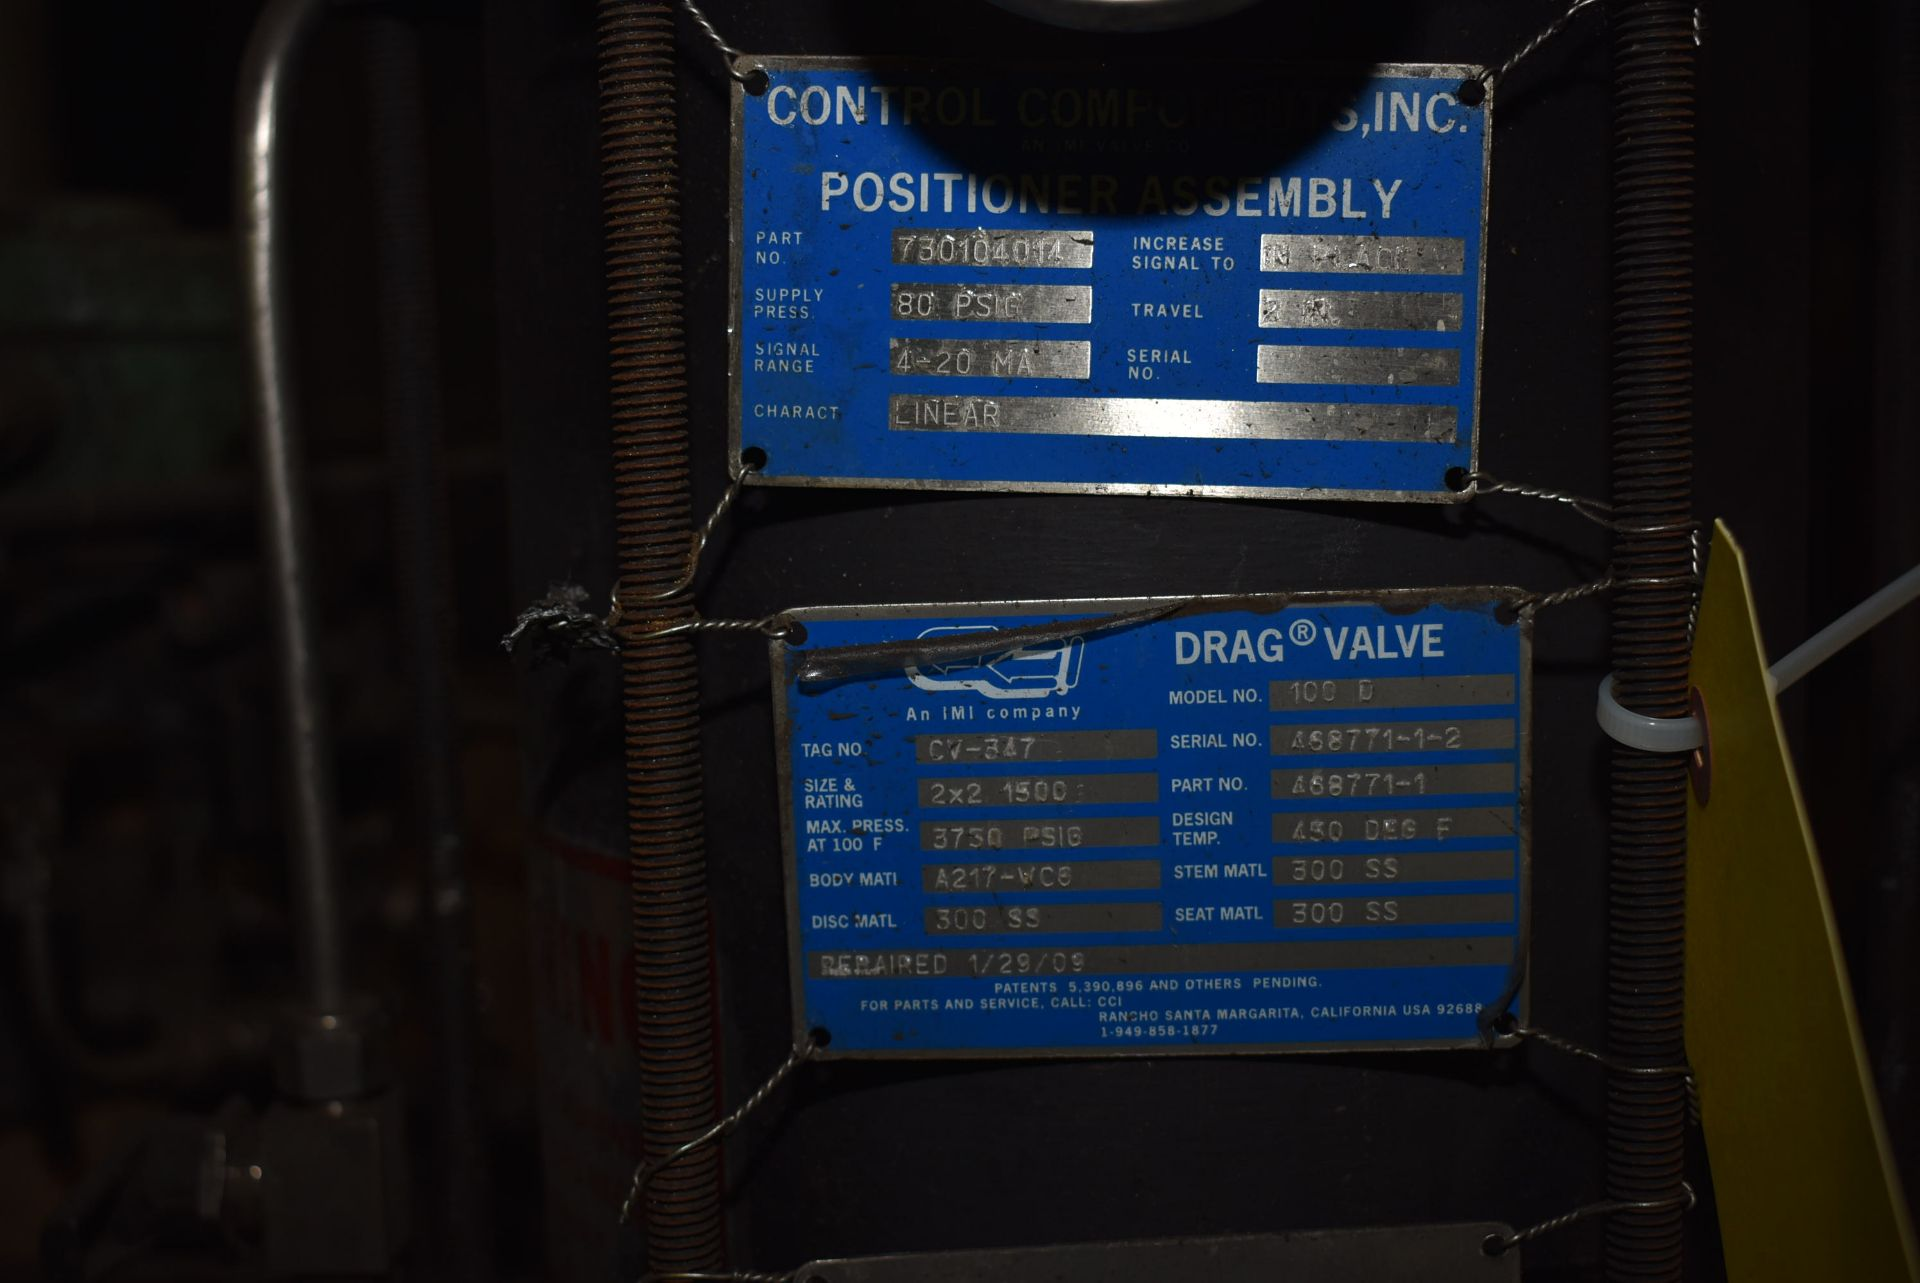 Lot 39 - (4) Control Components, Part #730104014 Positioner Assembly/2 x 2 Drag Valve